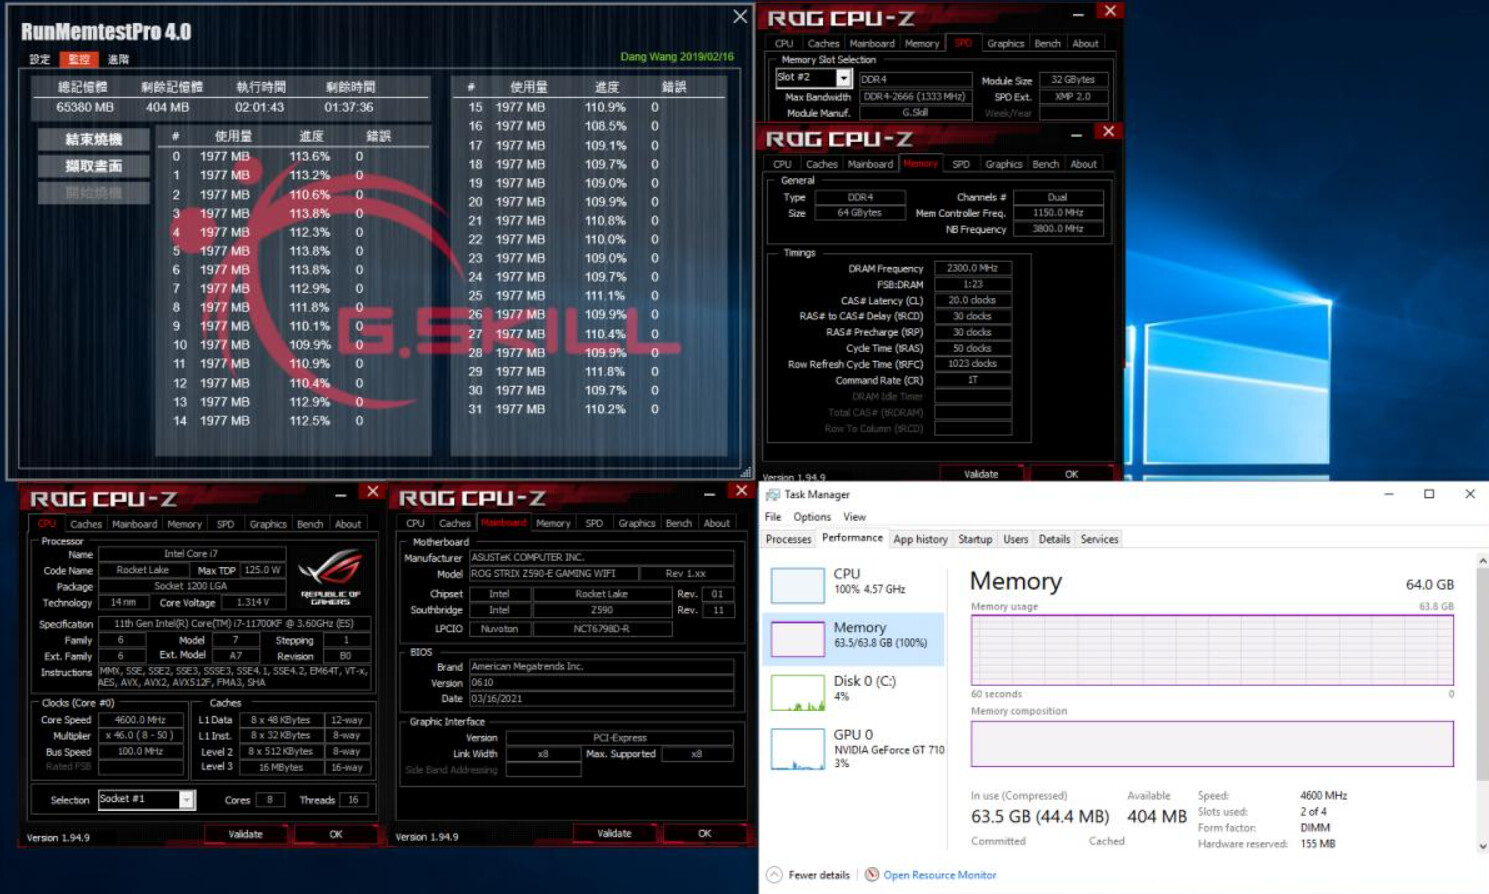 G.Skill представила 16-гигабайтный комплект памяти DDR4-5333 для платформы Z590